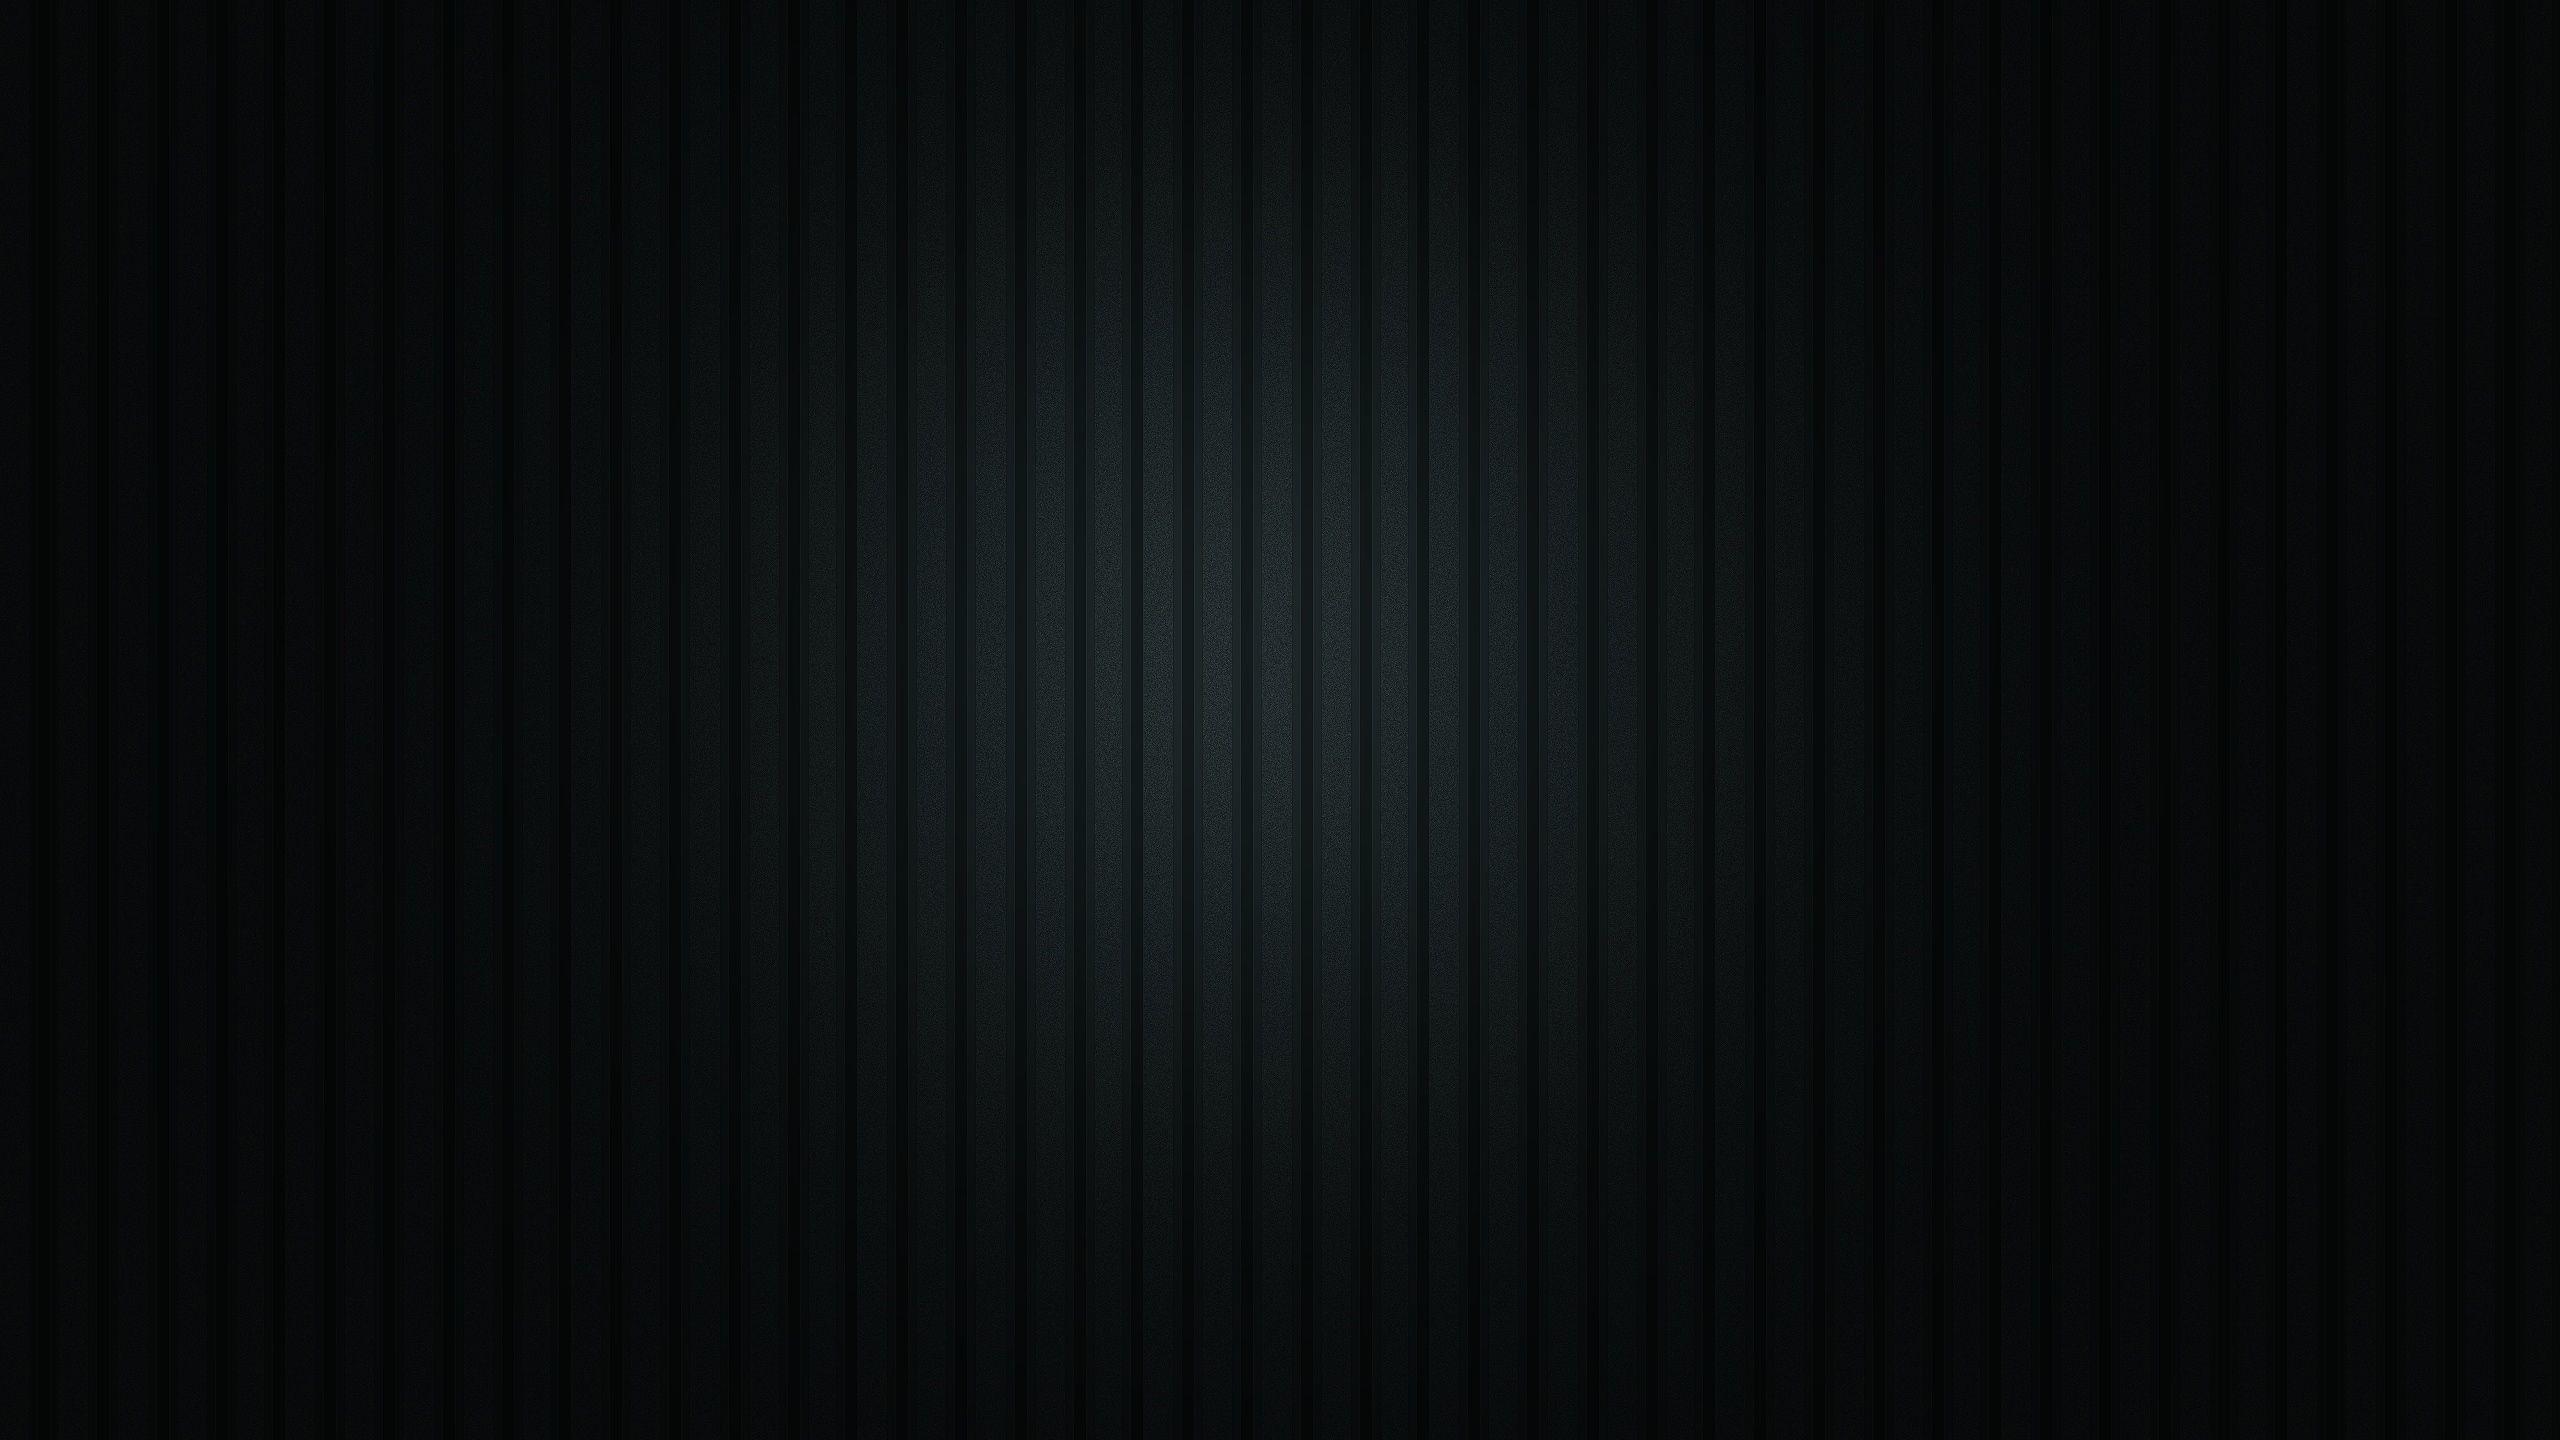 Download Wallpaper Black, Lines, Background, Spot Mac .